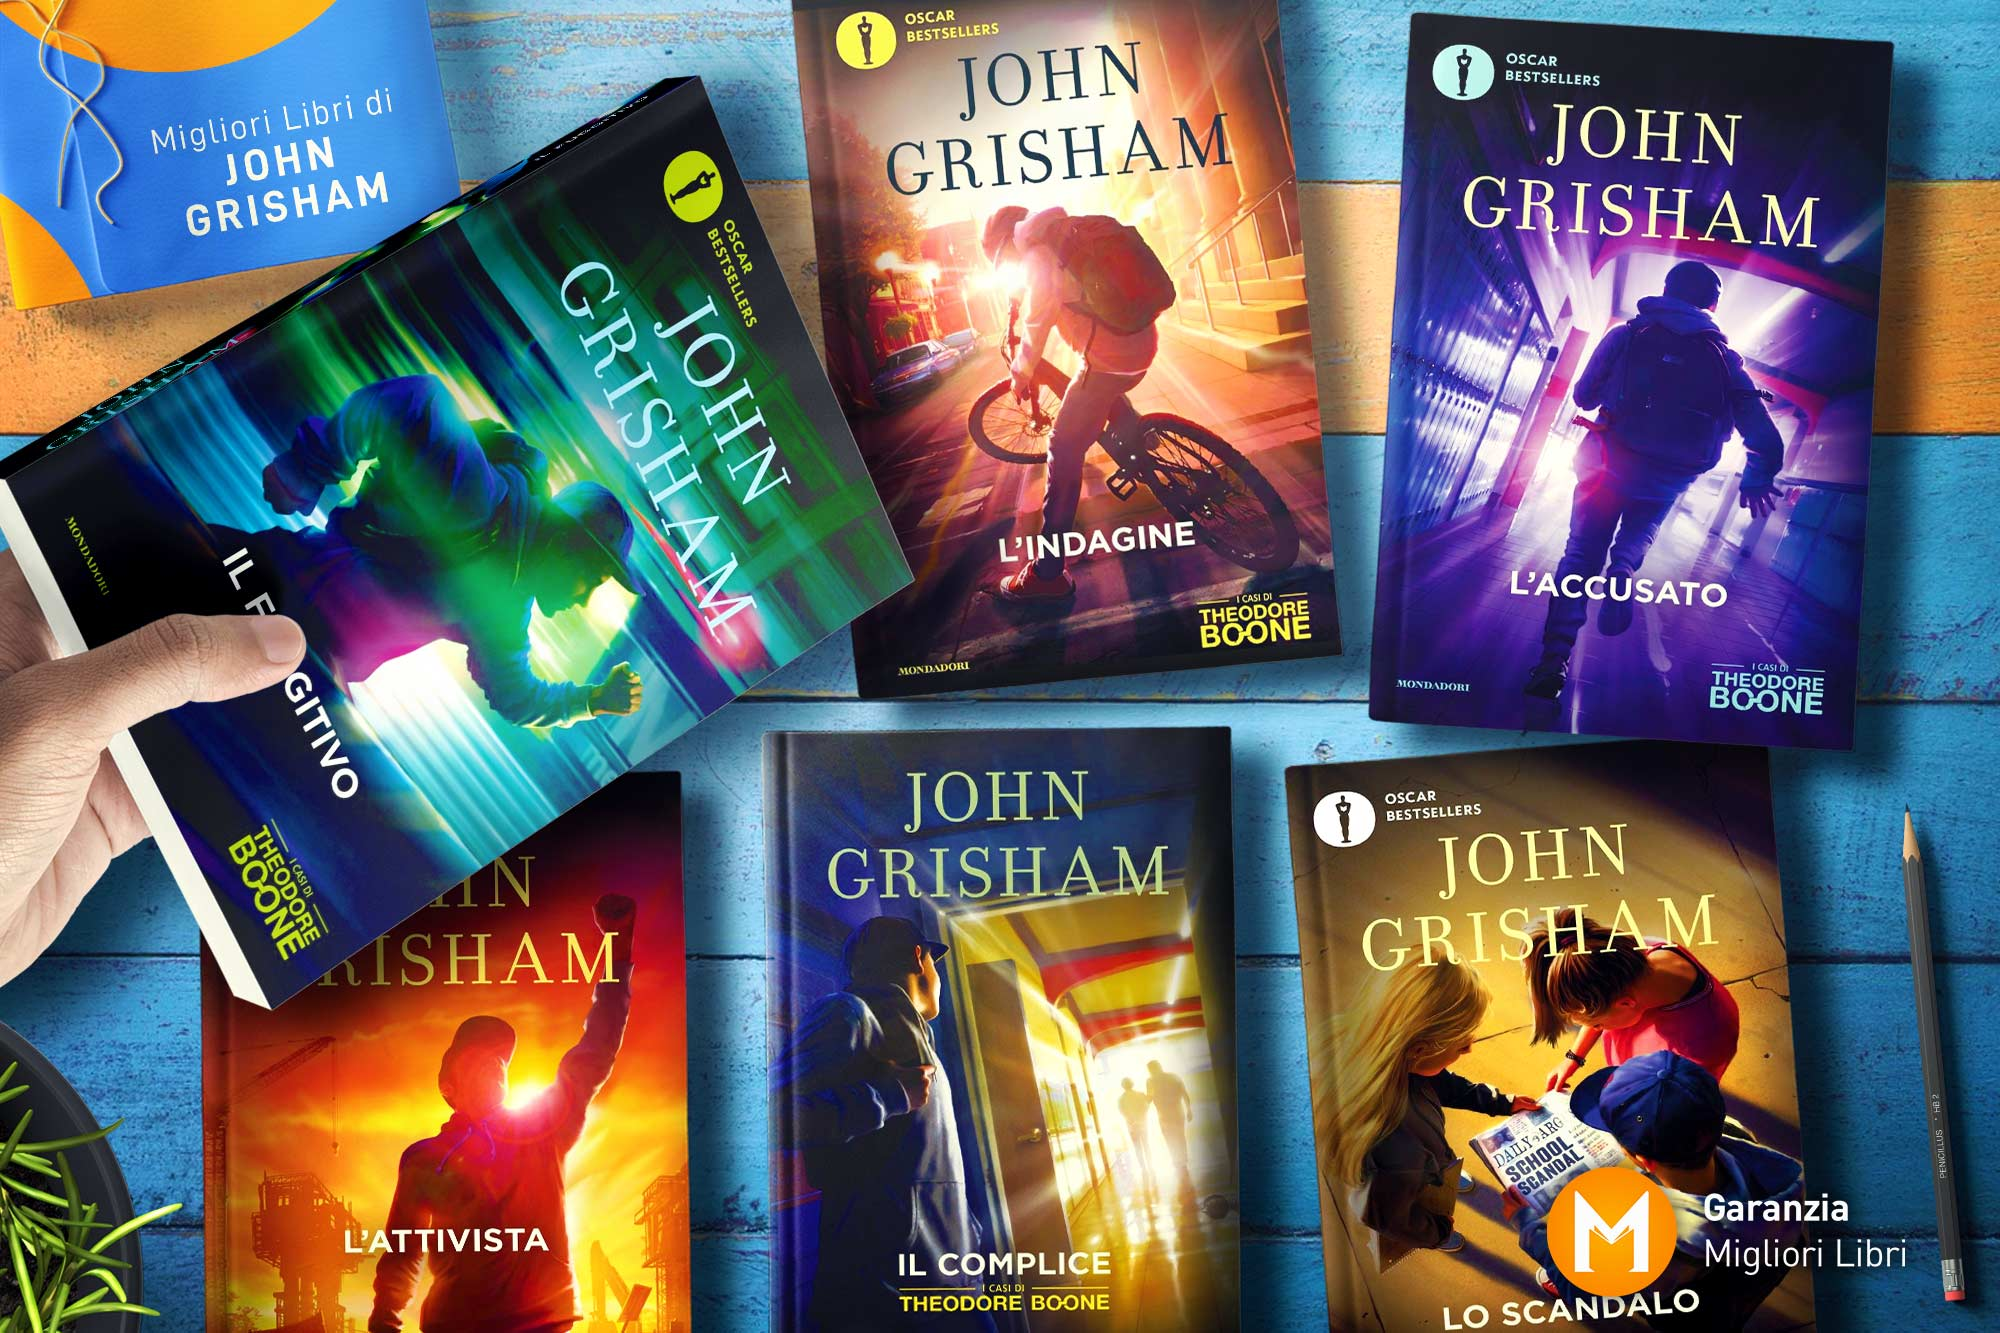 migliori-libri-john-grisham